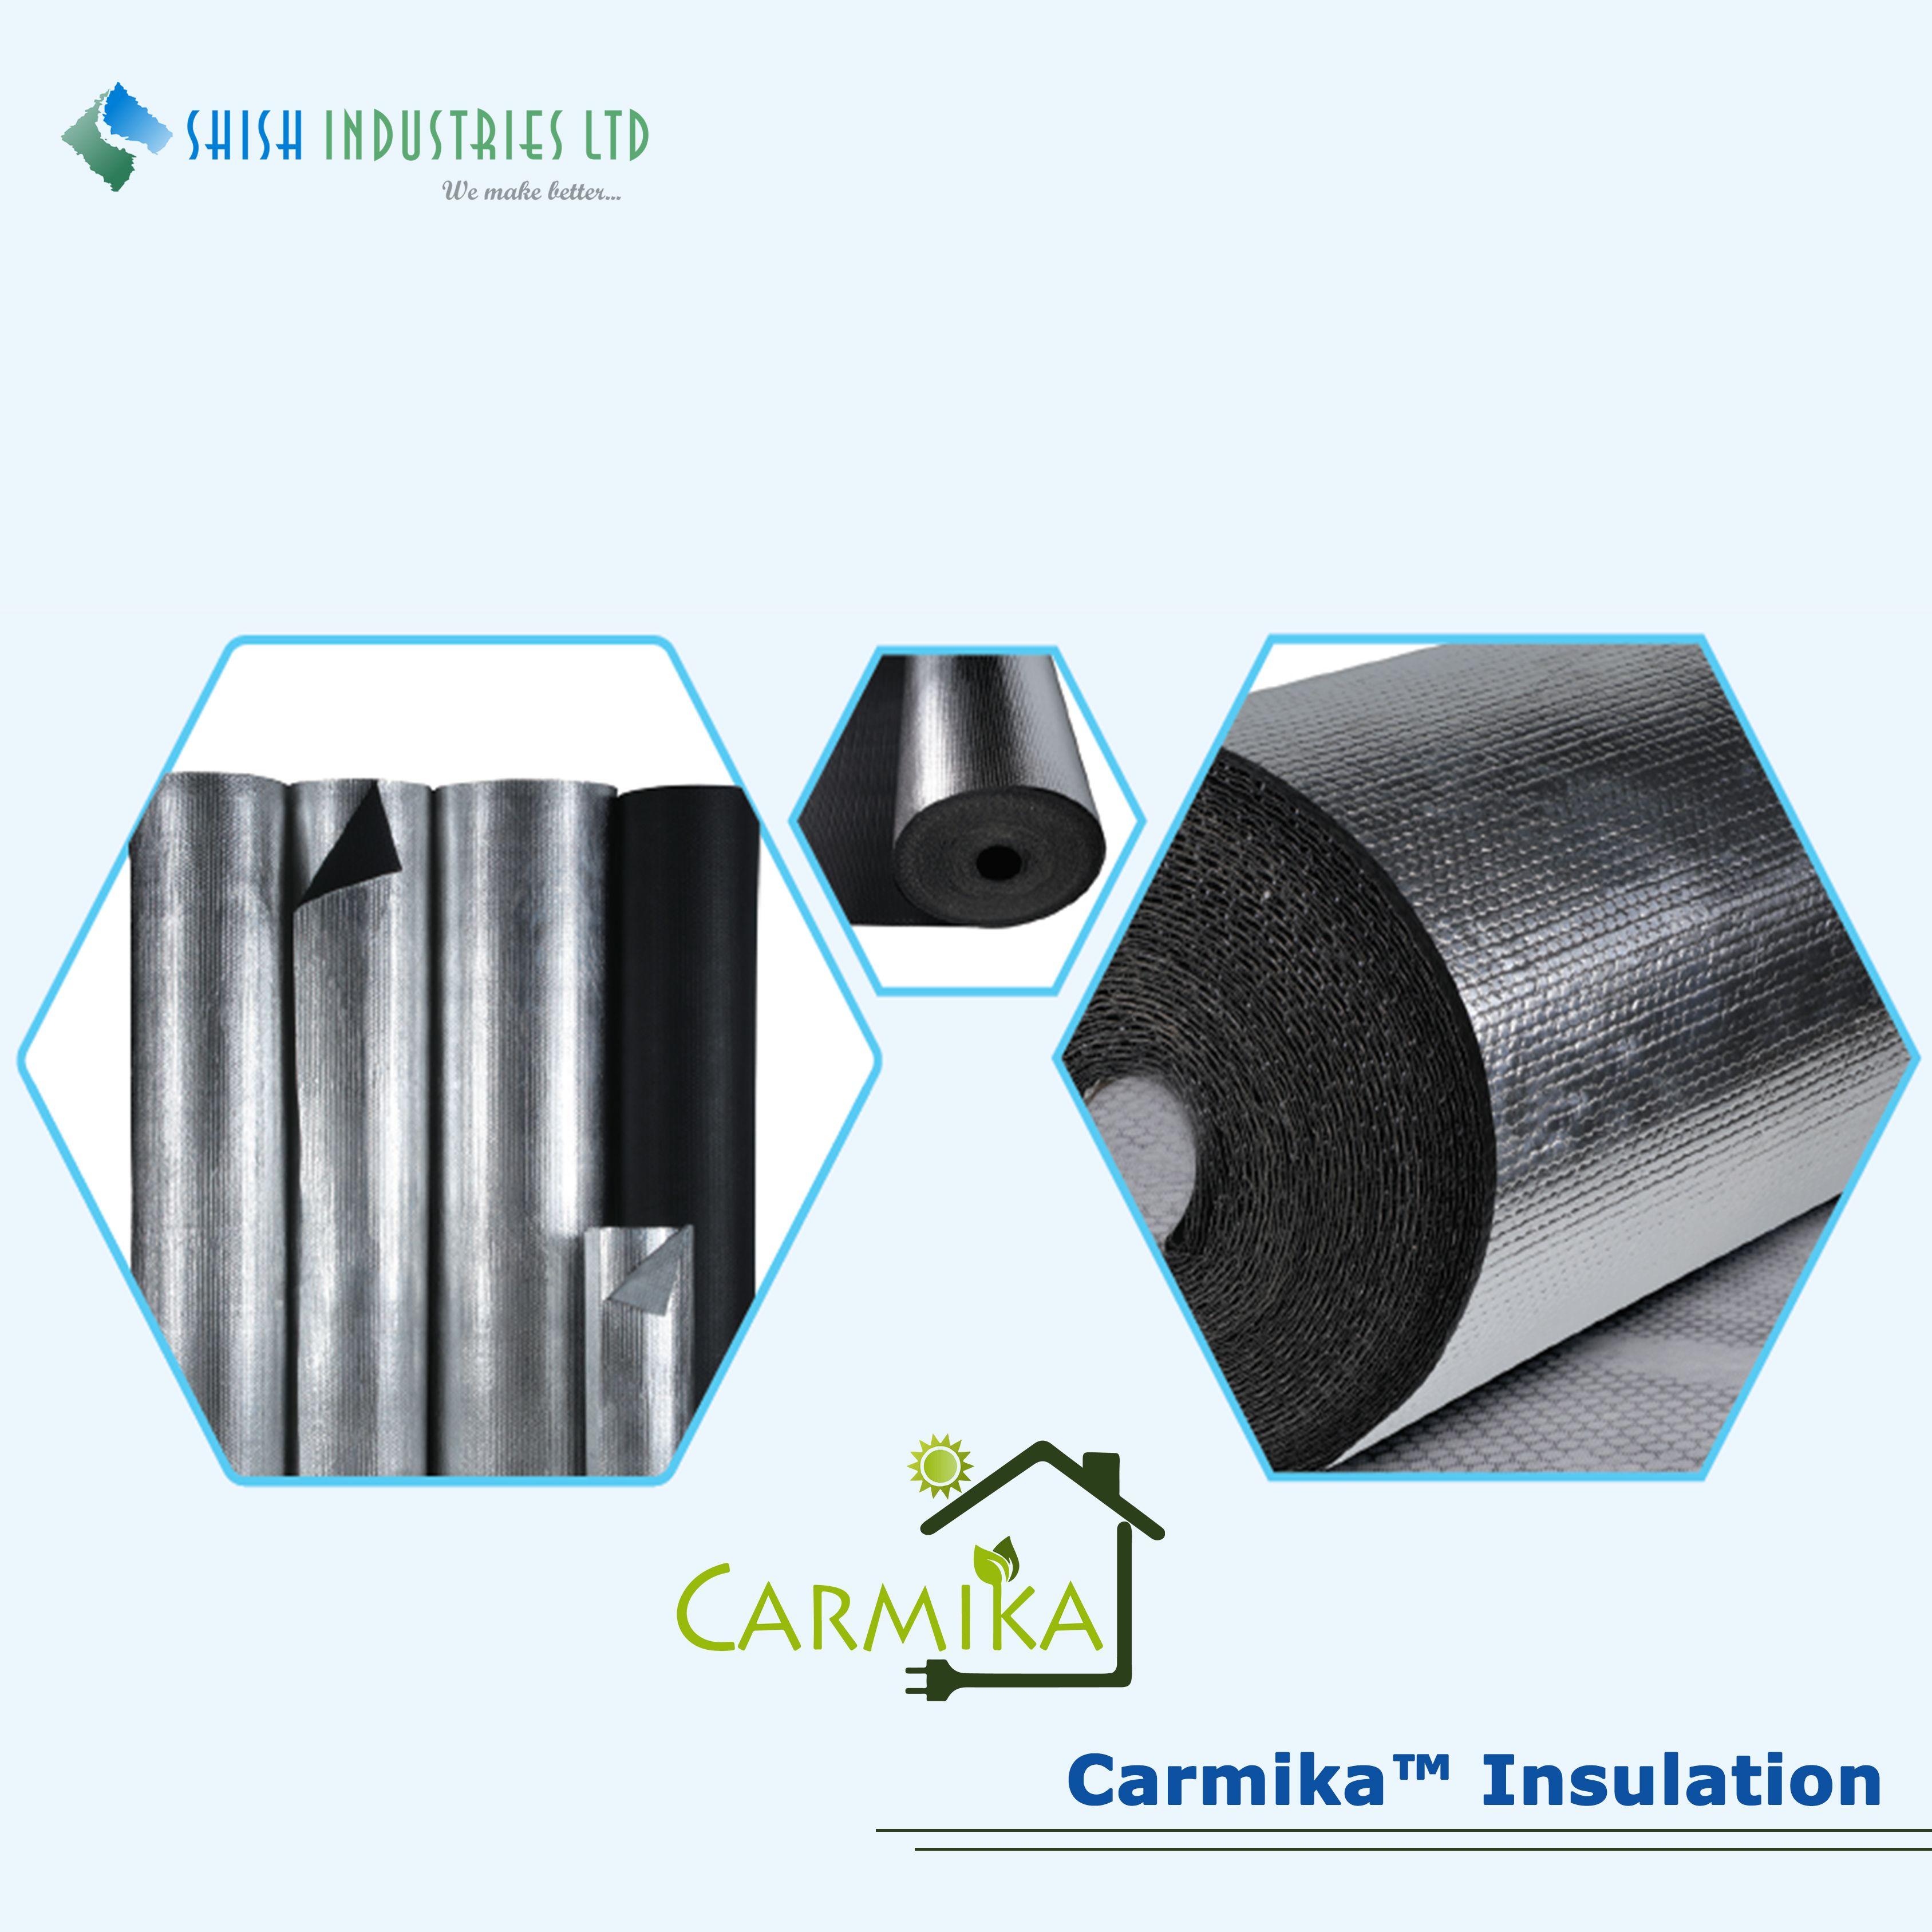 High Performance Reflective Insulation Carmika Slf High Performance Insulation Material Crafted Using Polypropylene And Aluminum Foil Insulation Corrugated Sheets Led Manufacturers